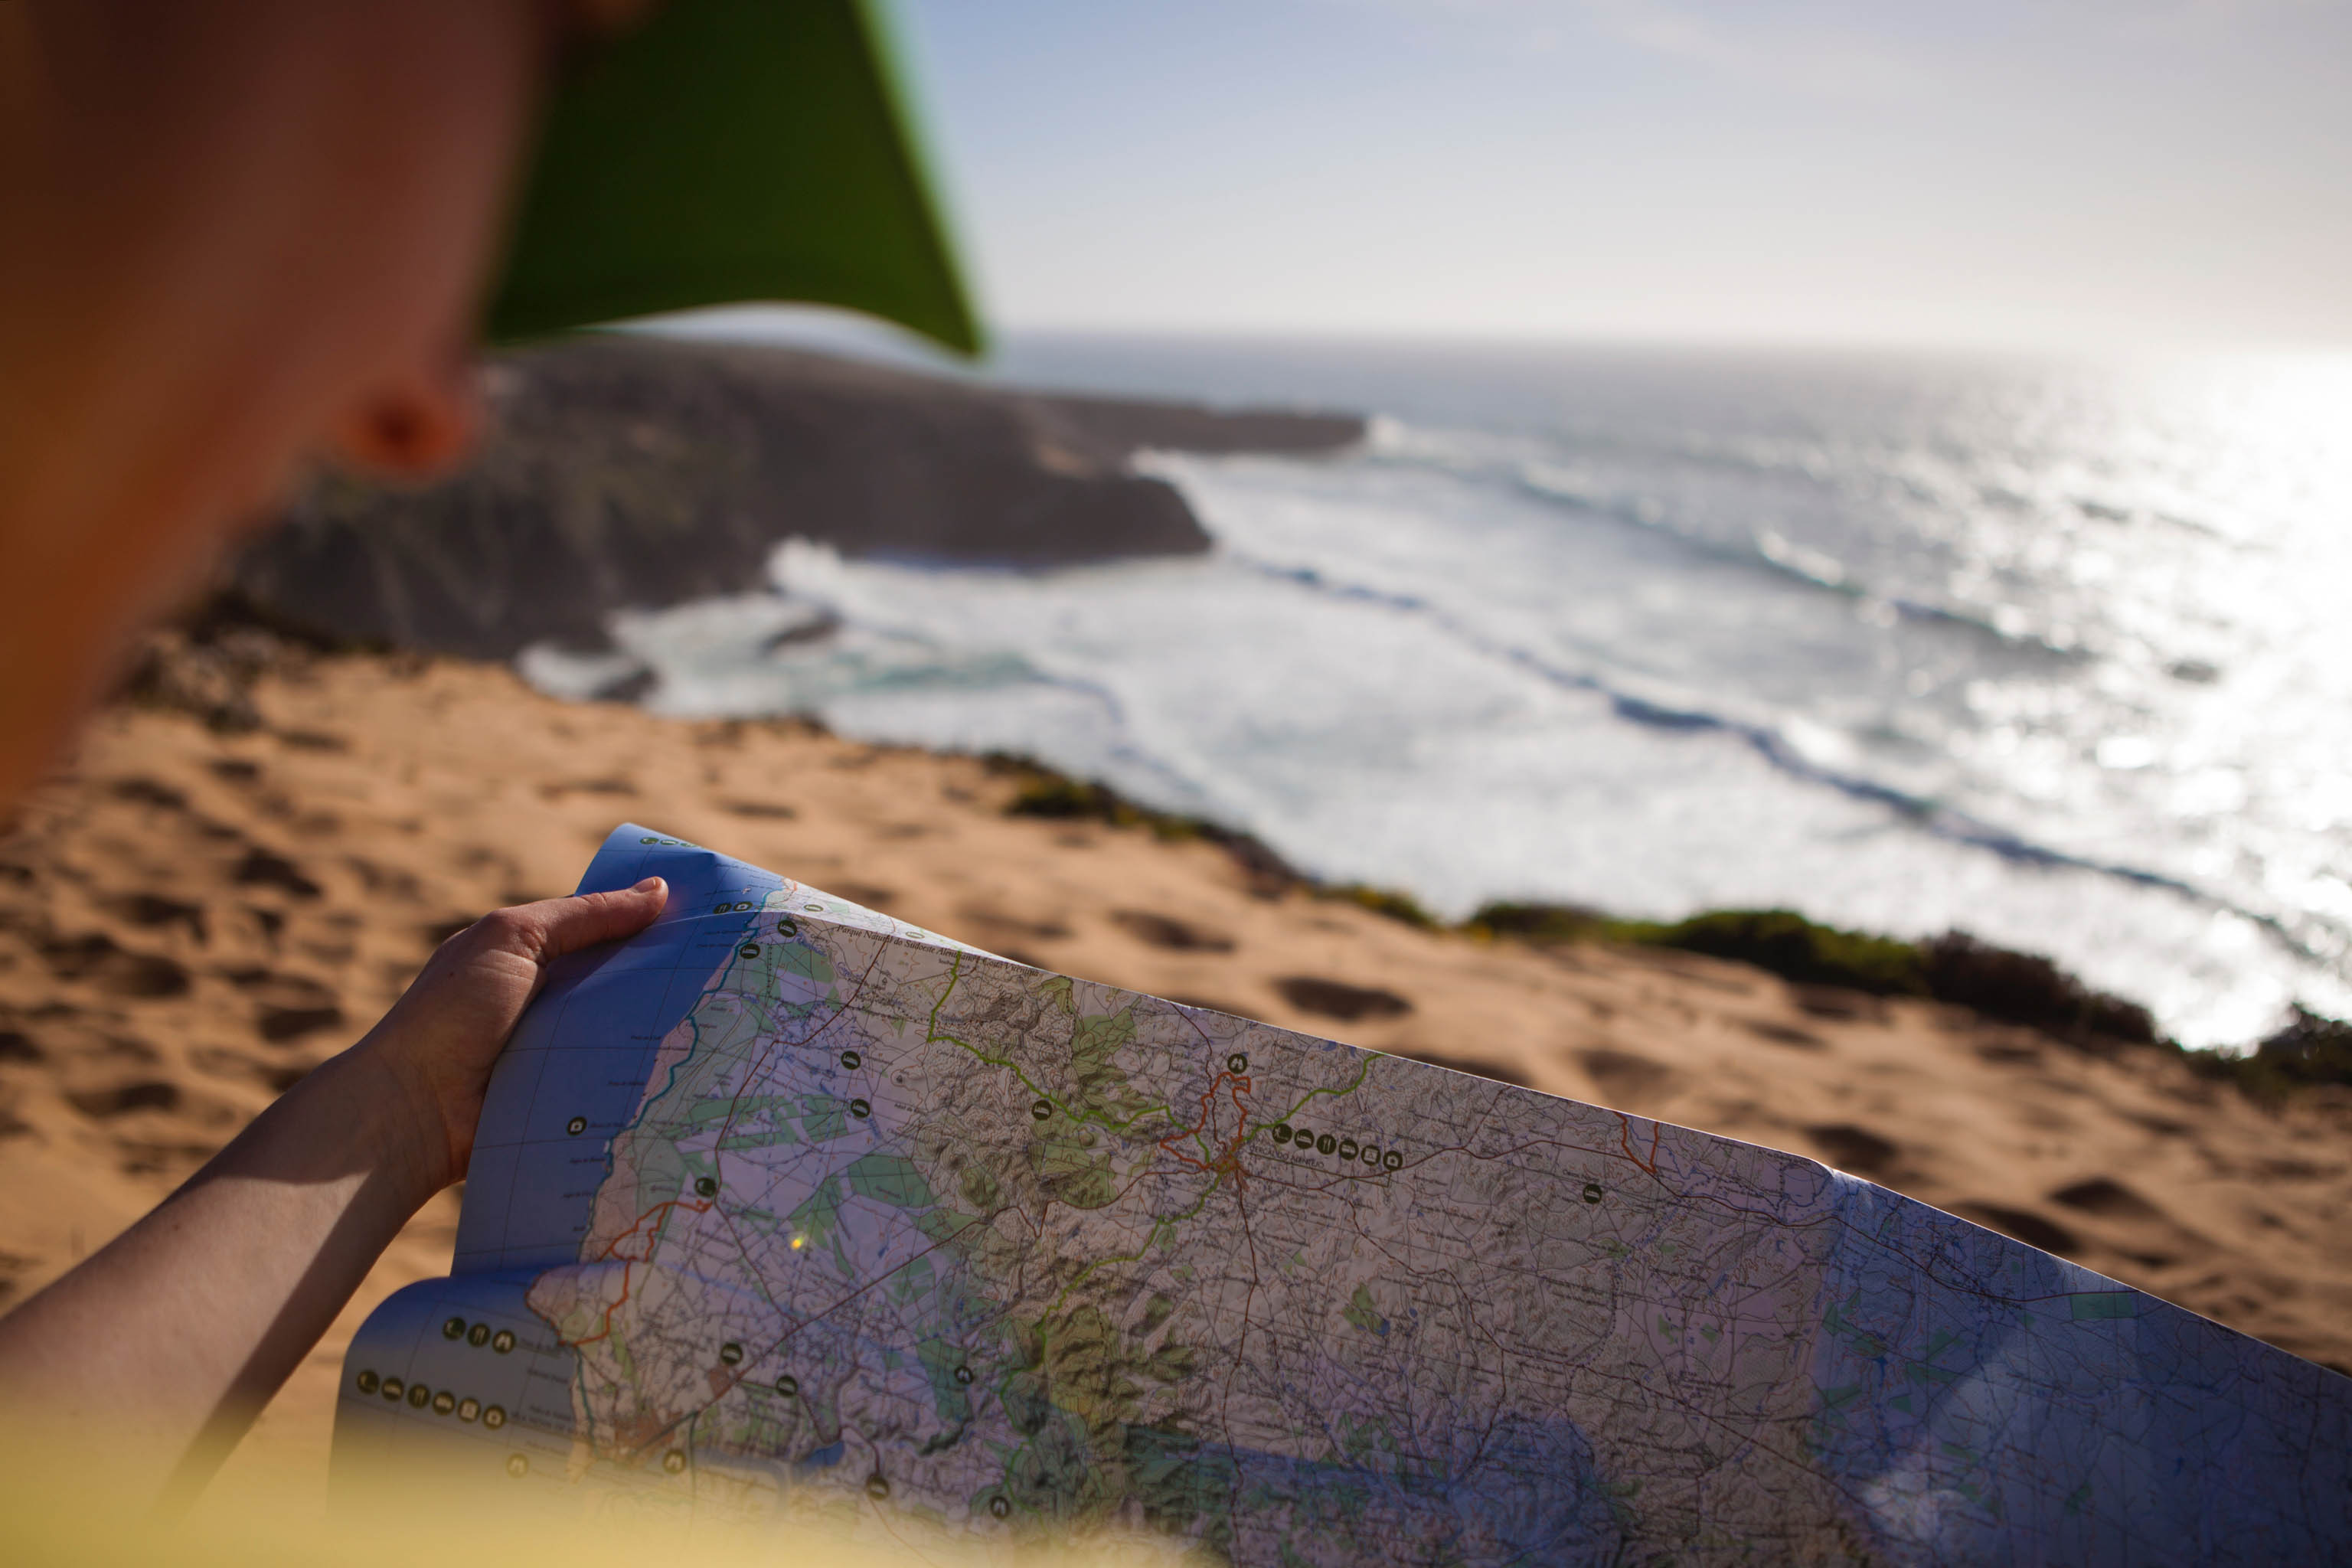 Rota Vicentina map: Fisherman's trail Portugal